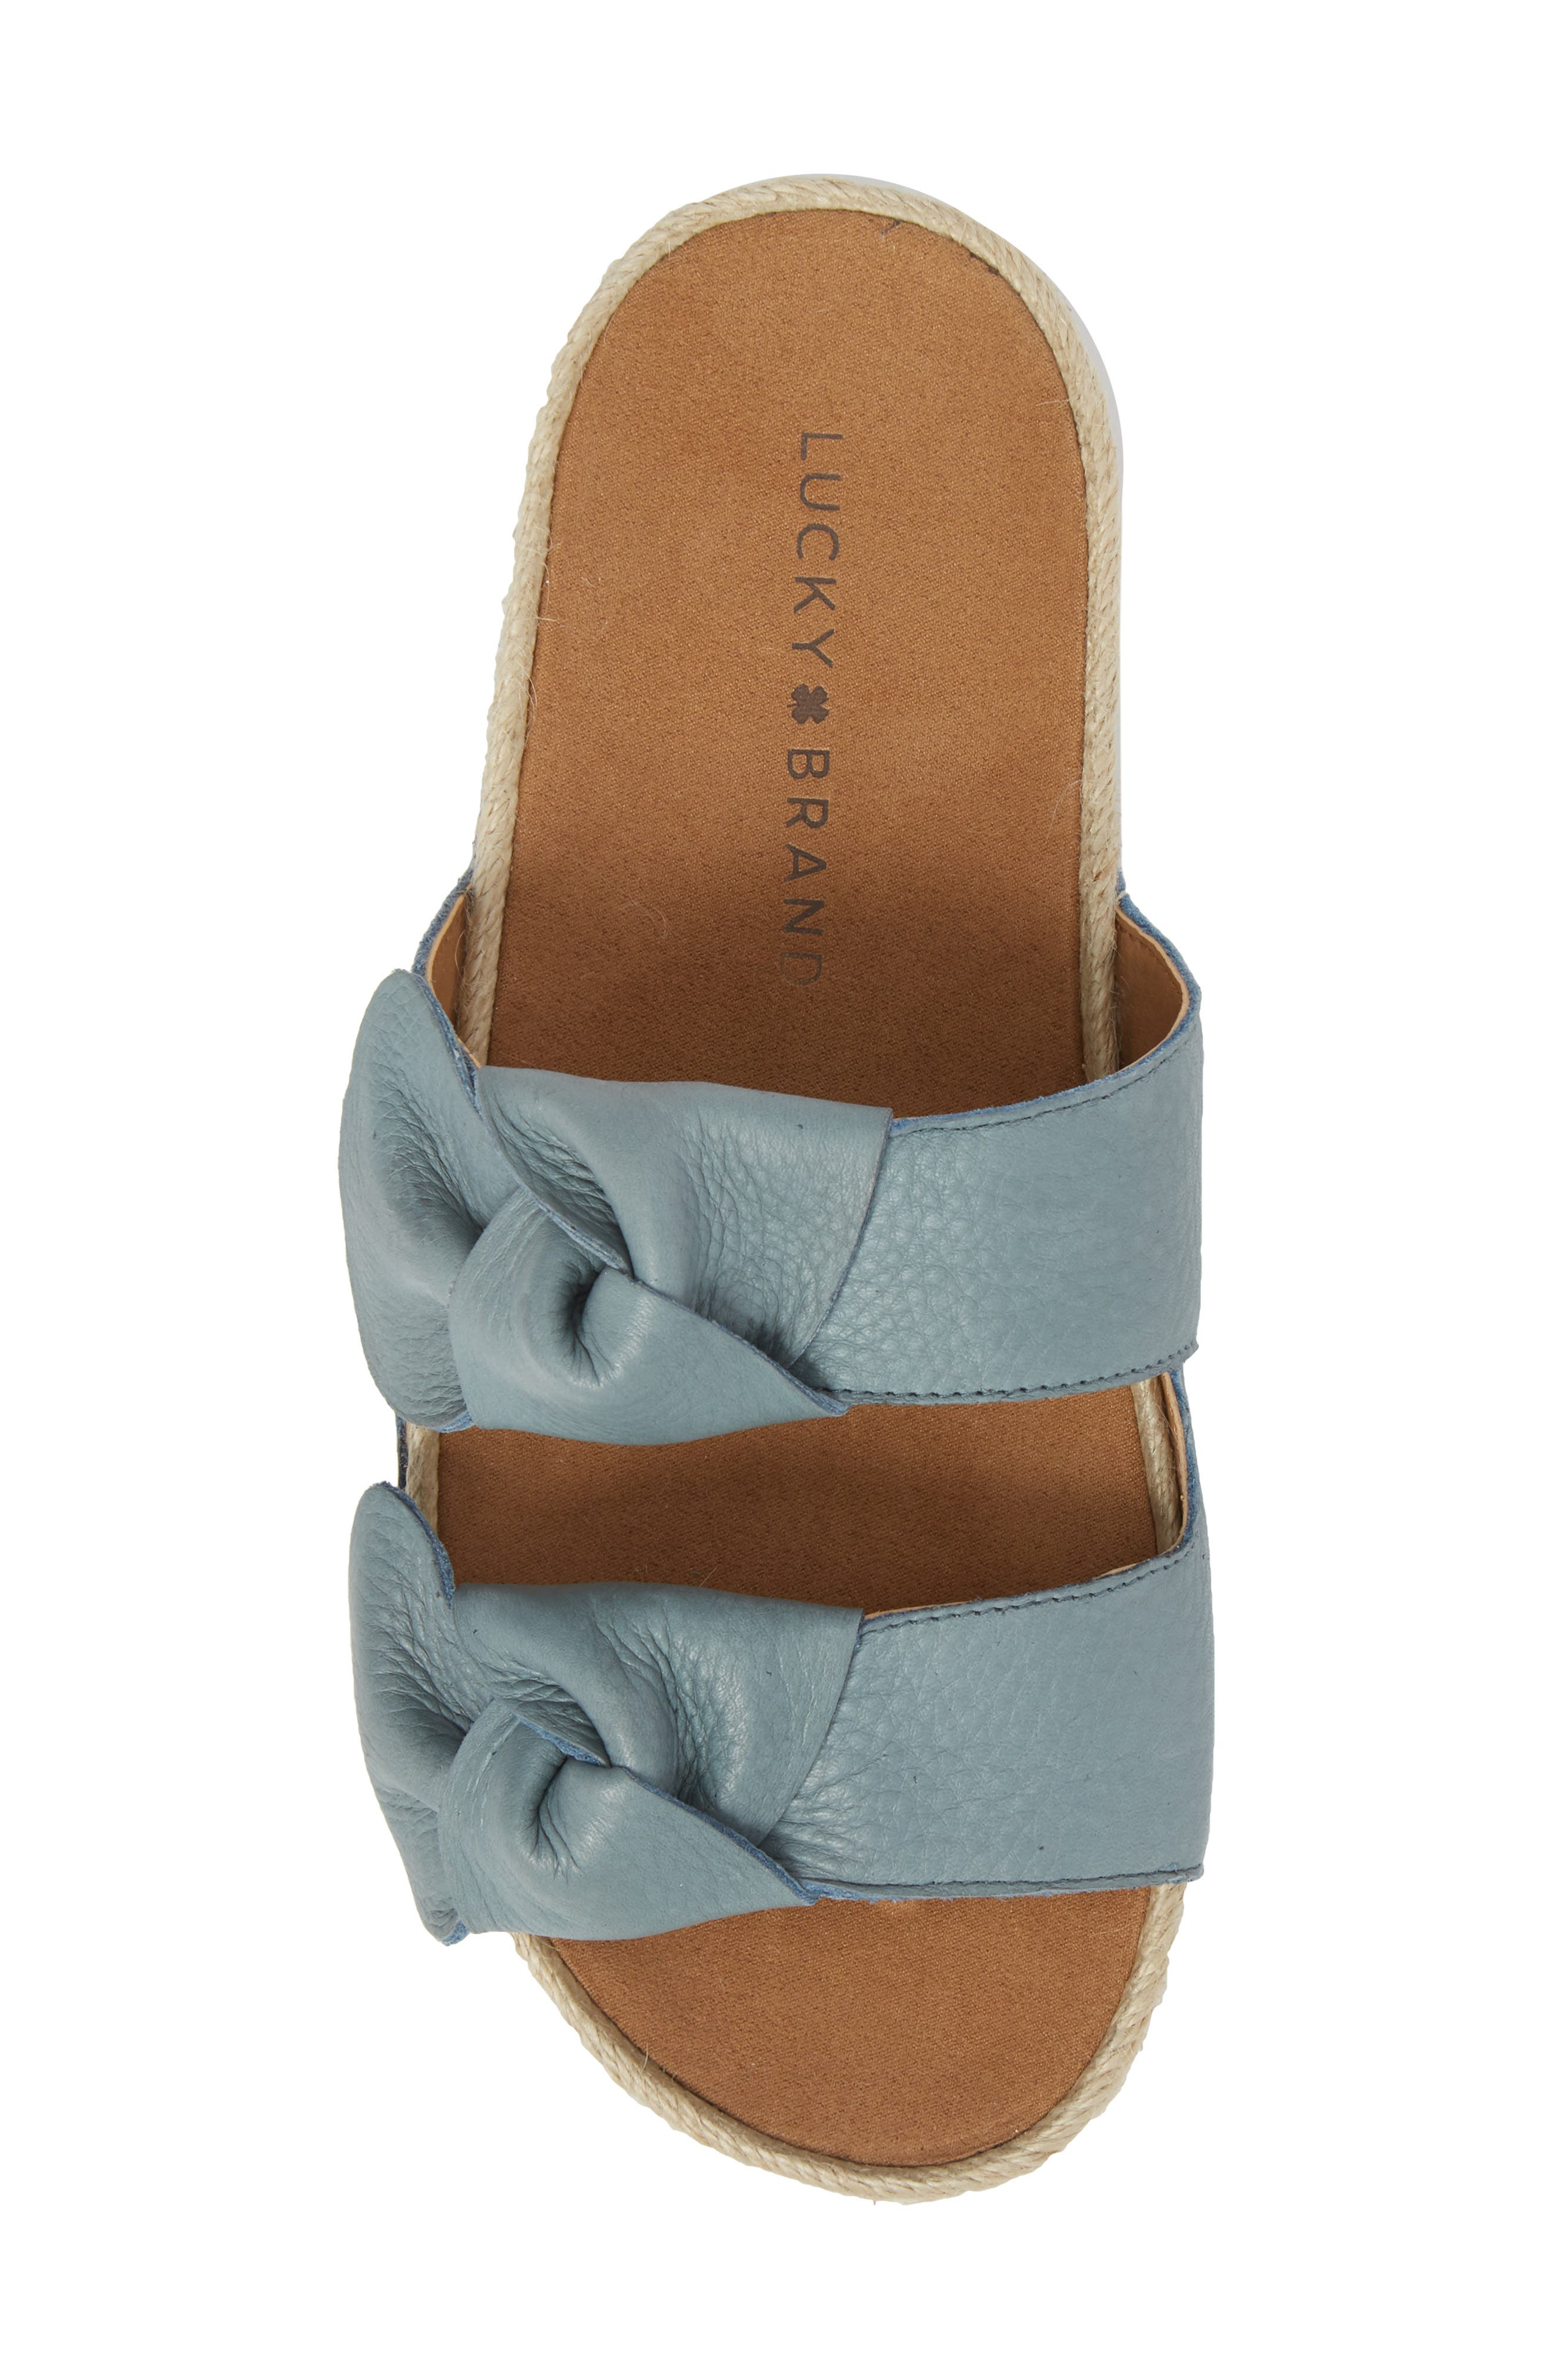 Izbremma Platform Espadrille Sandal,                             Alternate thumbnail 5, color,                             Infinity Leather